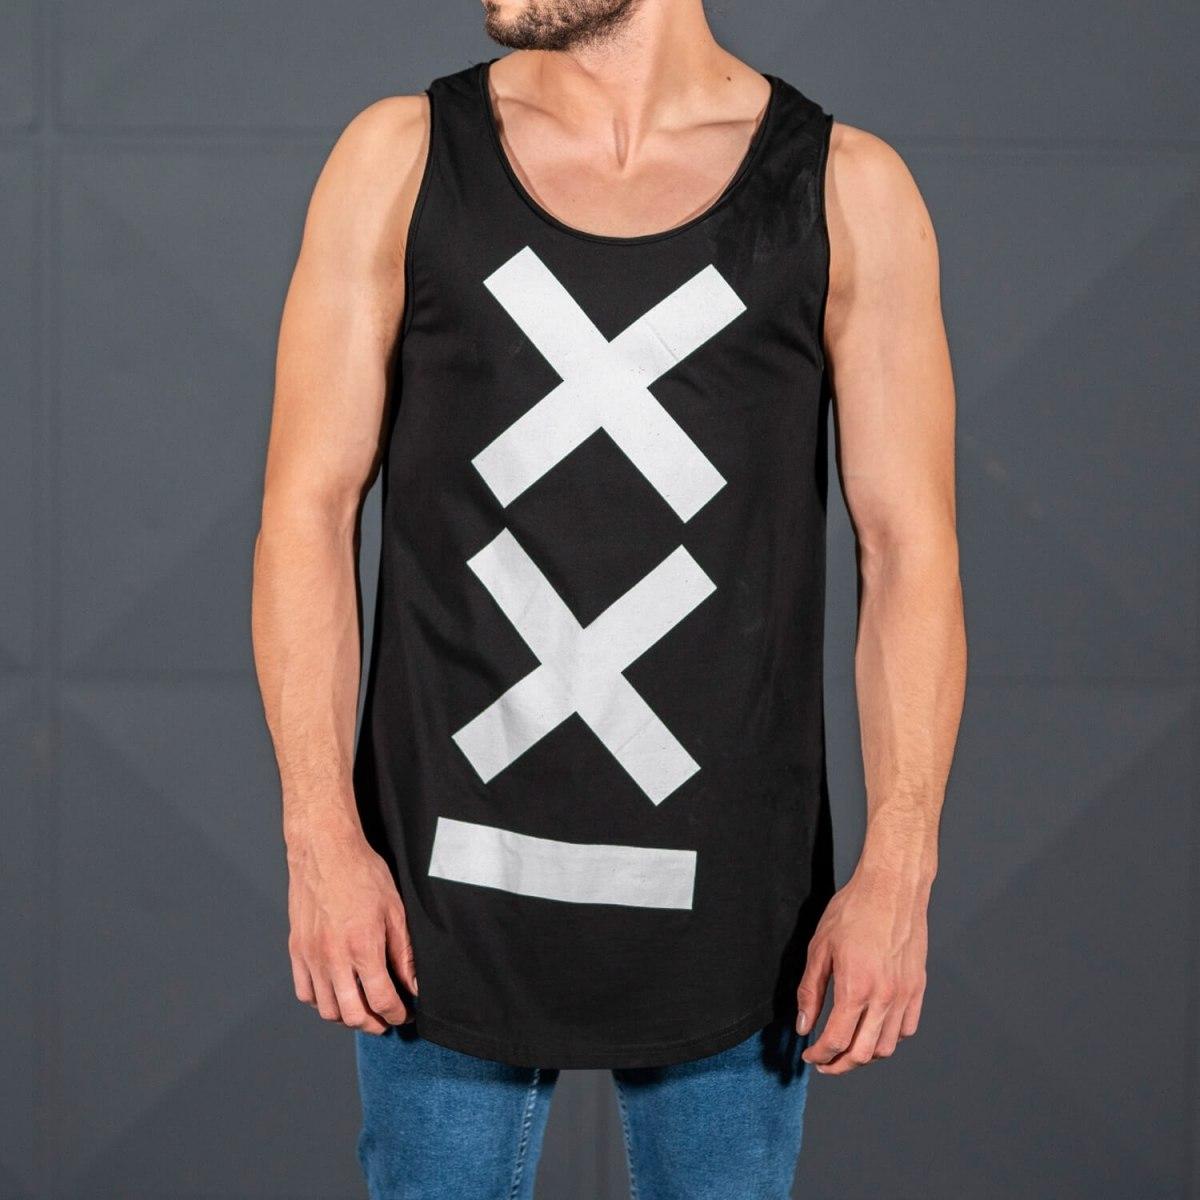 Men's Athletic Sleeveless XX Tall Tank Top Black Mv Premium Brand - 2